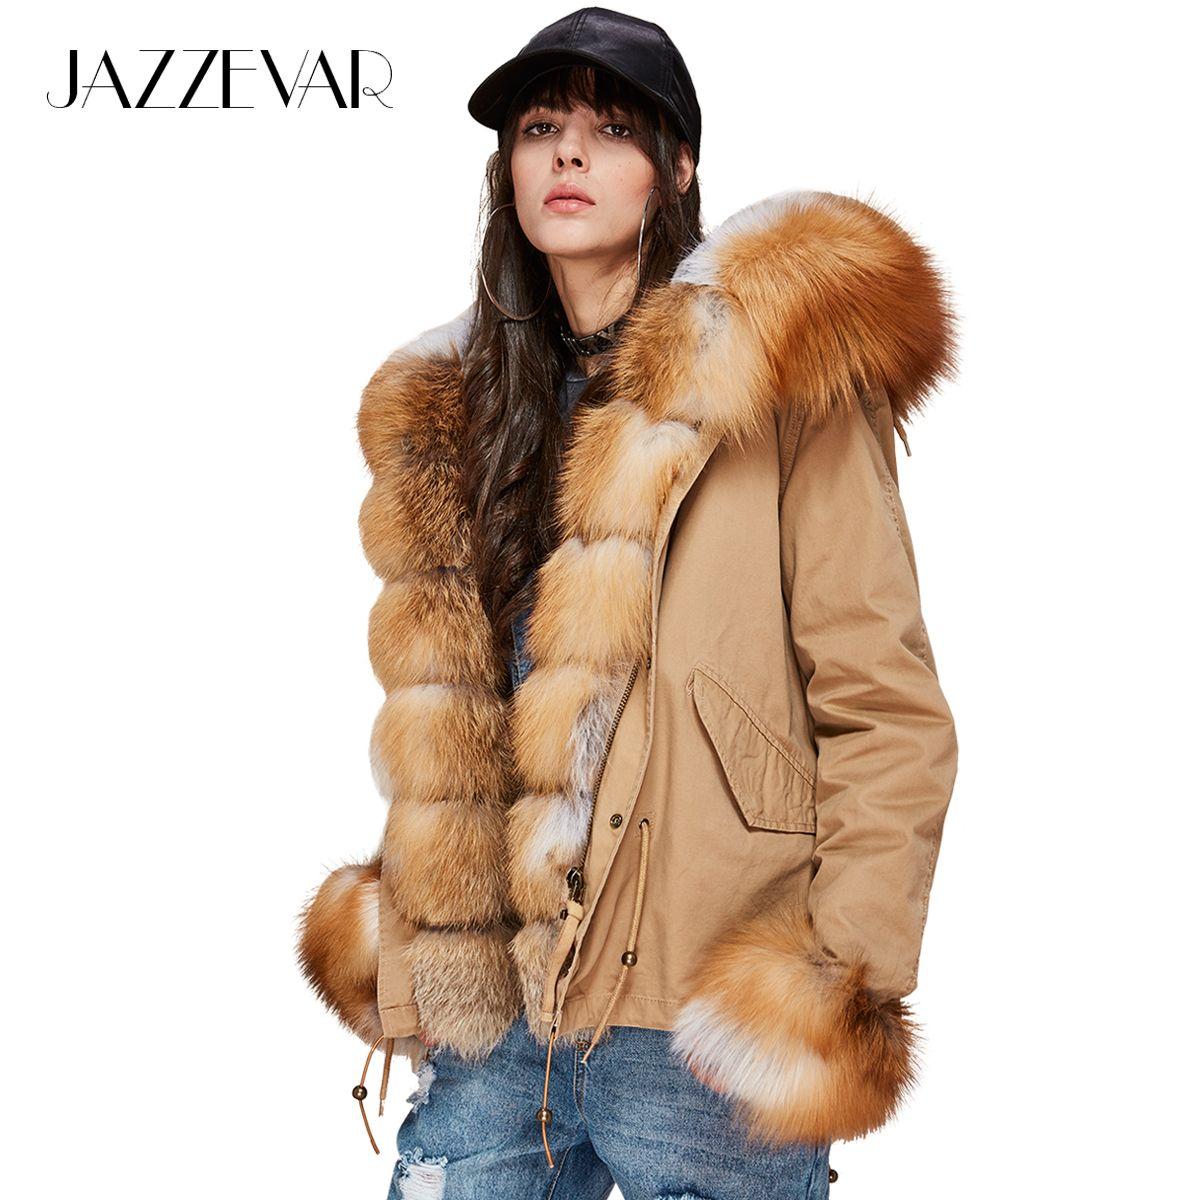 JAZZEVAR New Fashion Women's Luxurious Large Real Fox Fur Collar Cuff Hooded Coat Short Parkas Outwear Winter Jacket